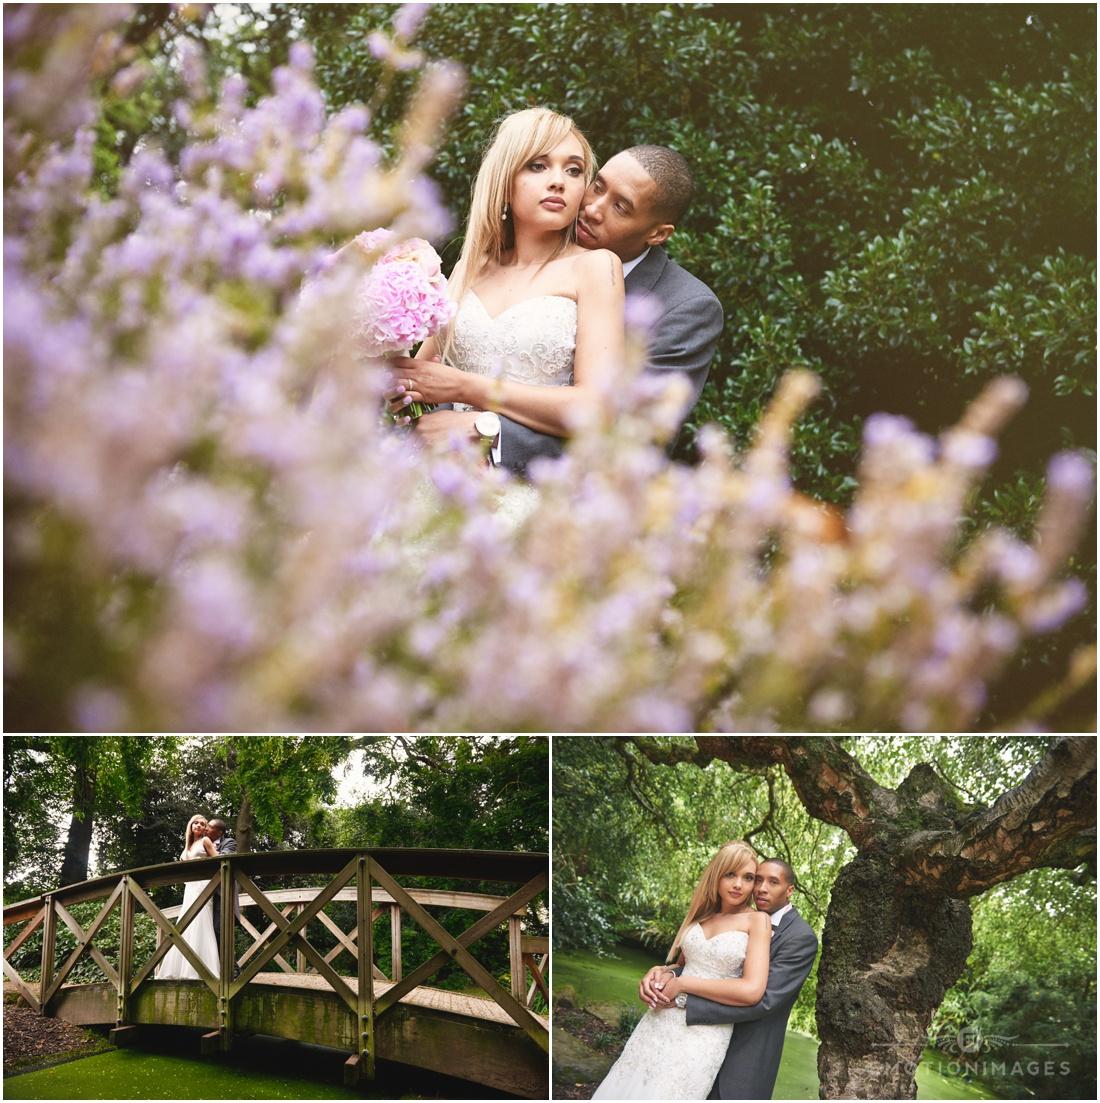 York_House_Twickenham_Wedding_Photography_015.JPG